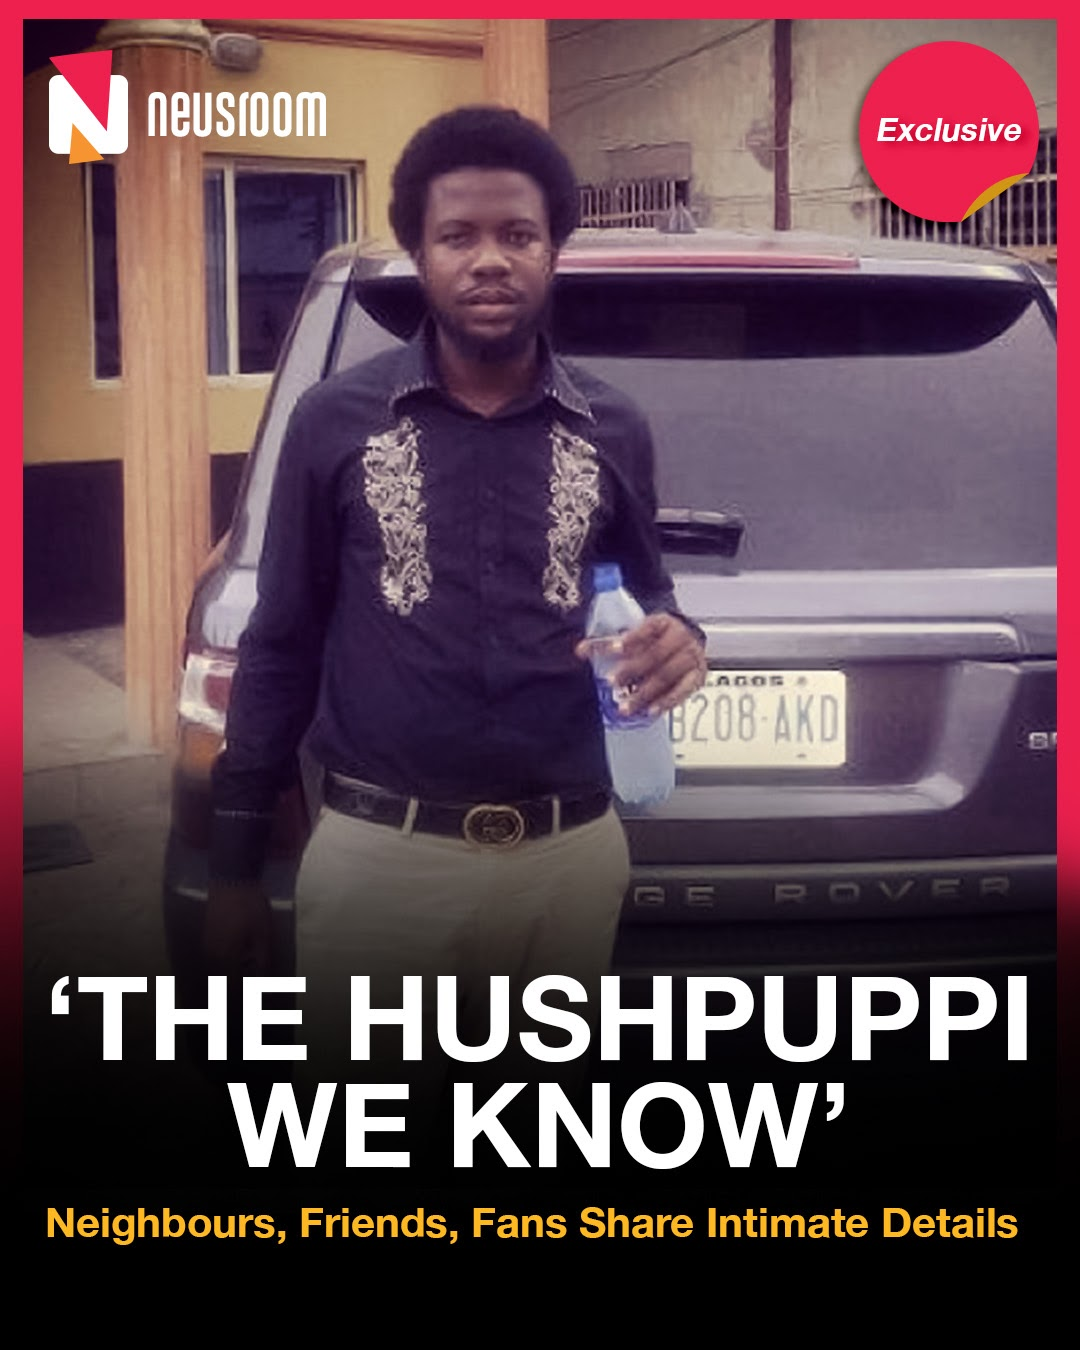 the hushpuppi we know neusroom